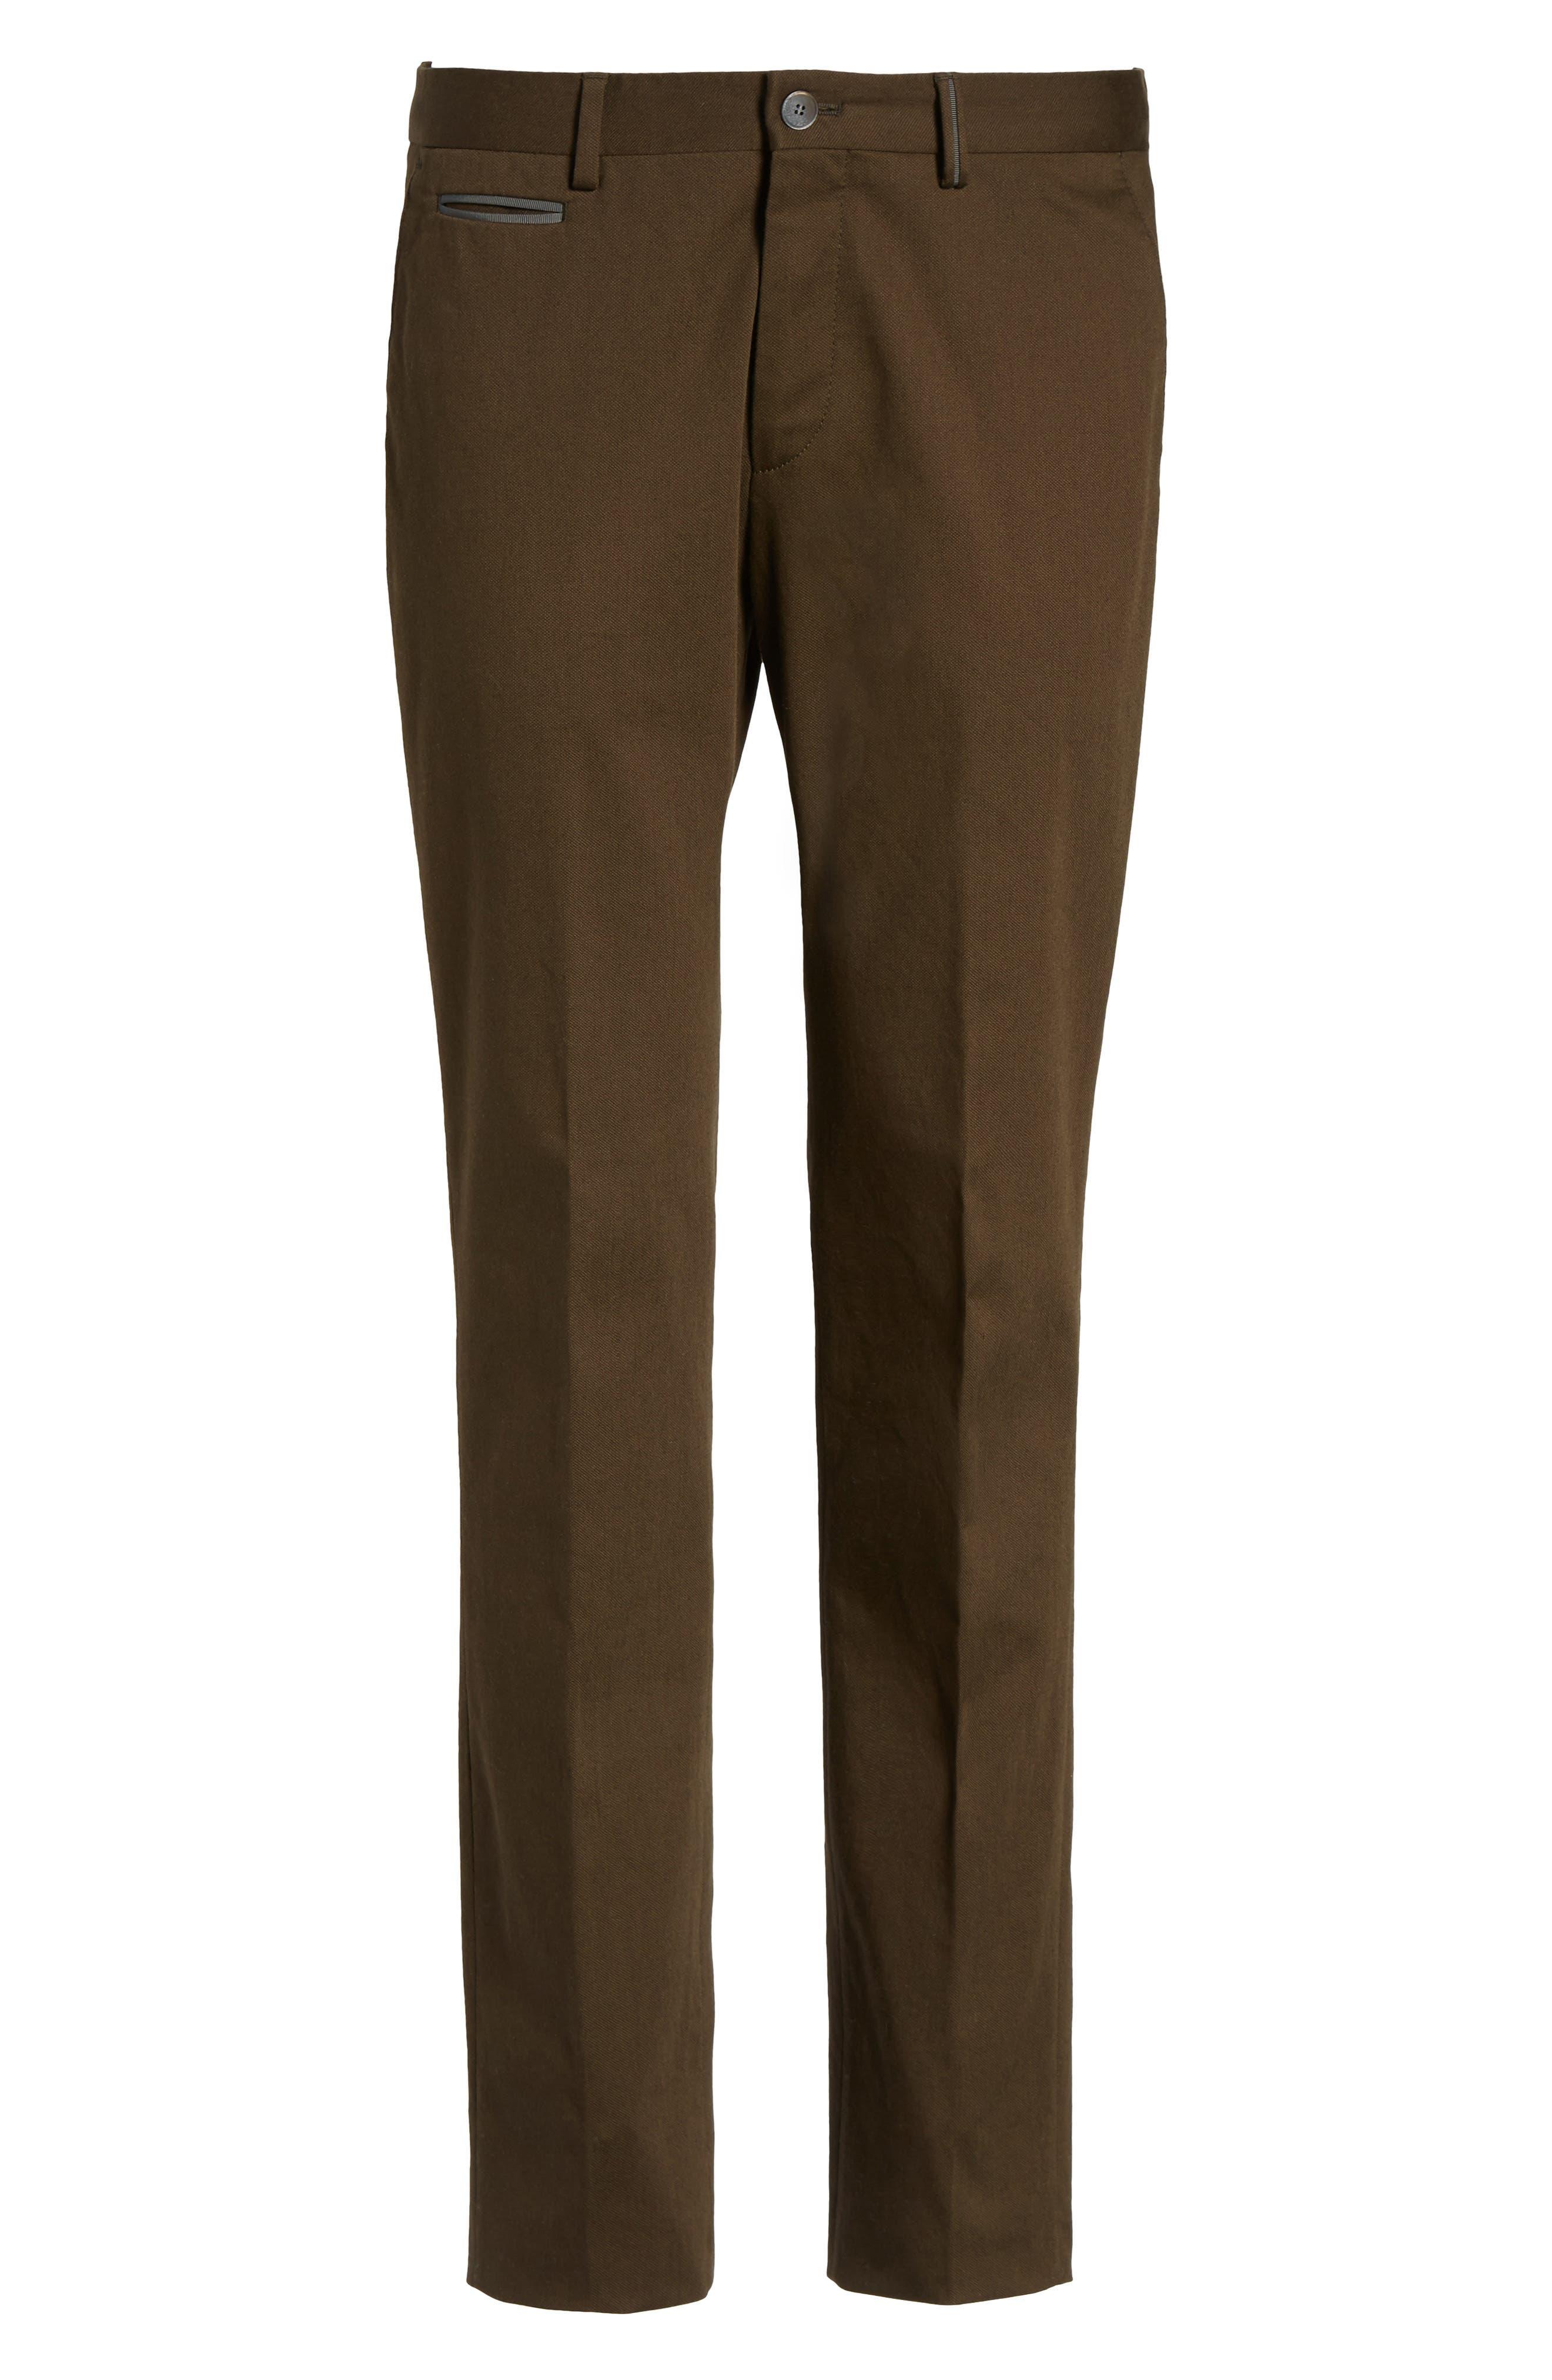 Batho-W Regular Fit Trousers,                             Alternate thumbnail 6, color,                             342